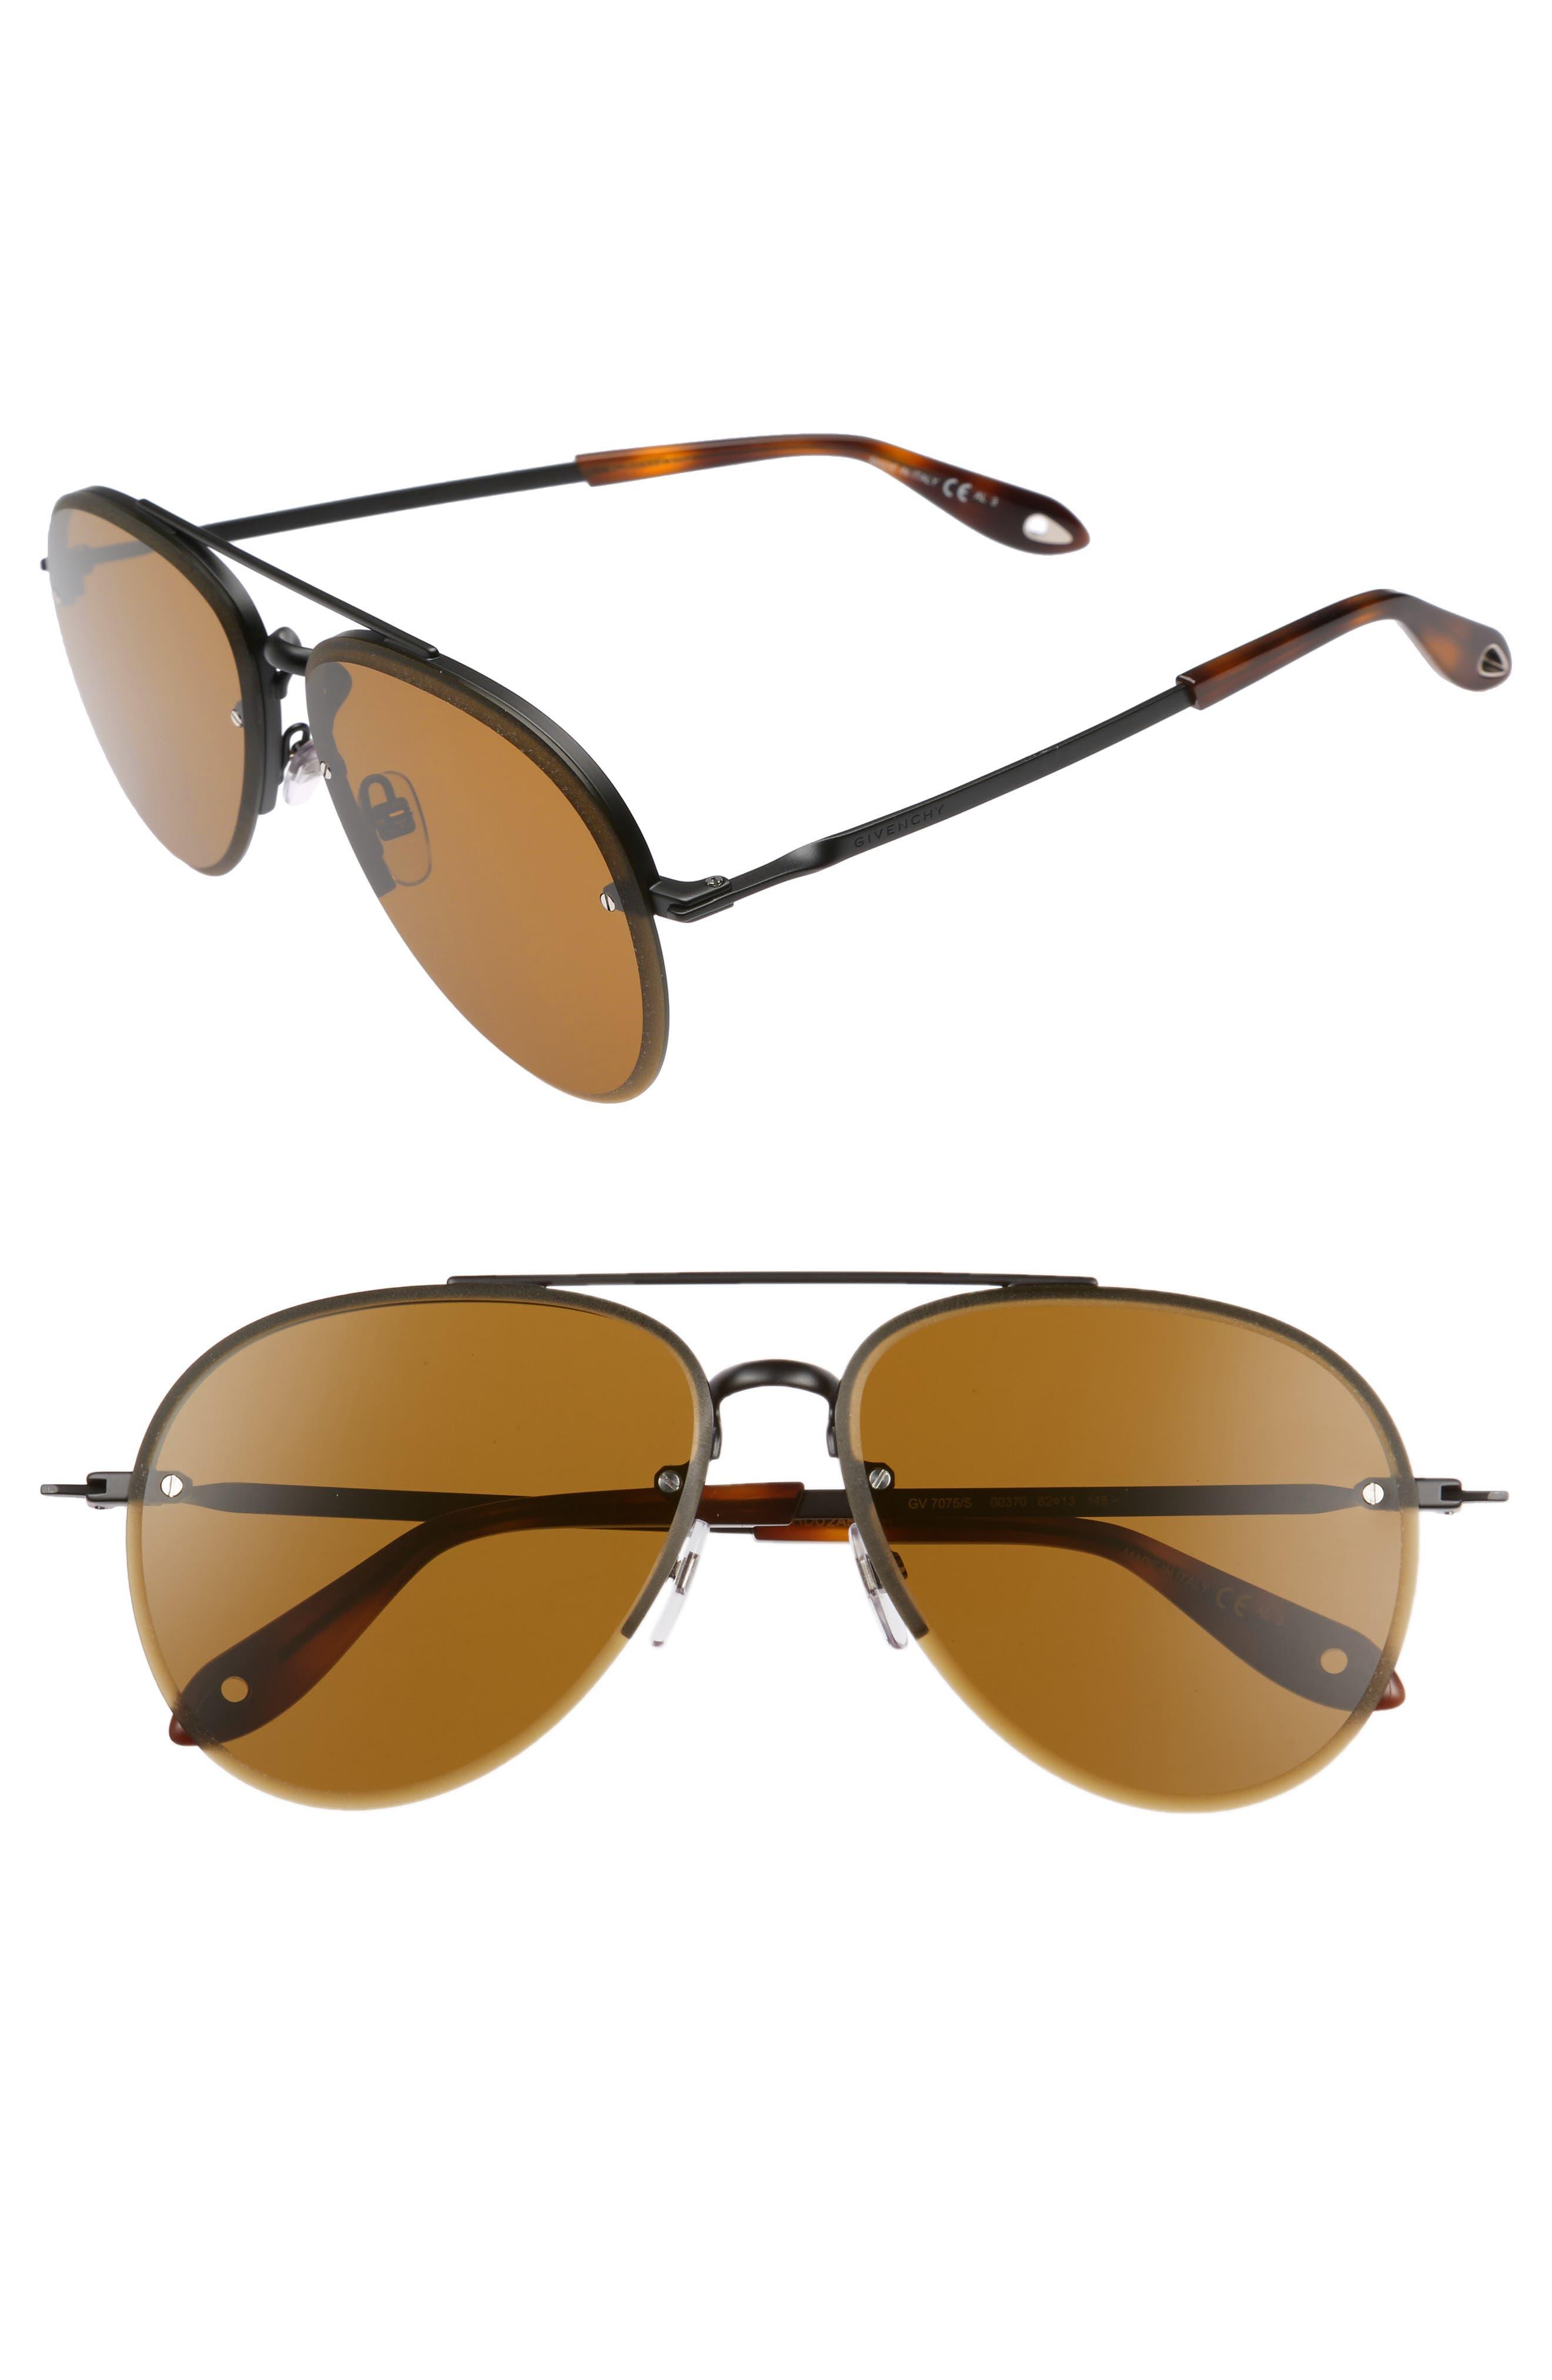 62mm Oversize Aviator Sunglasses,                             Main thumbnail 1, color,                             001